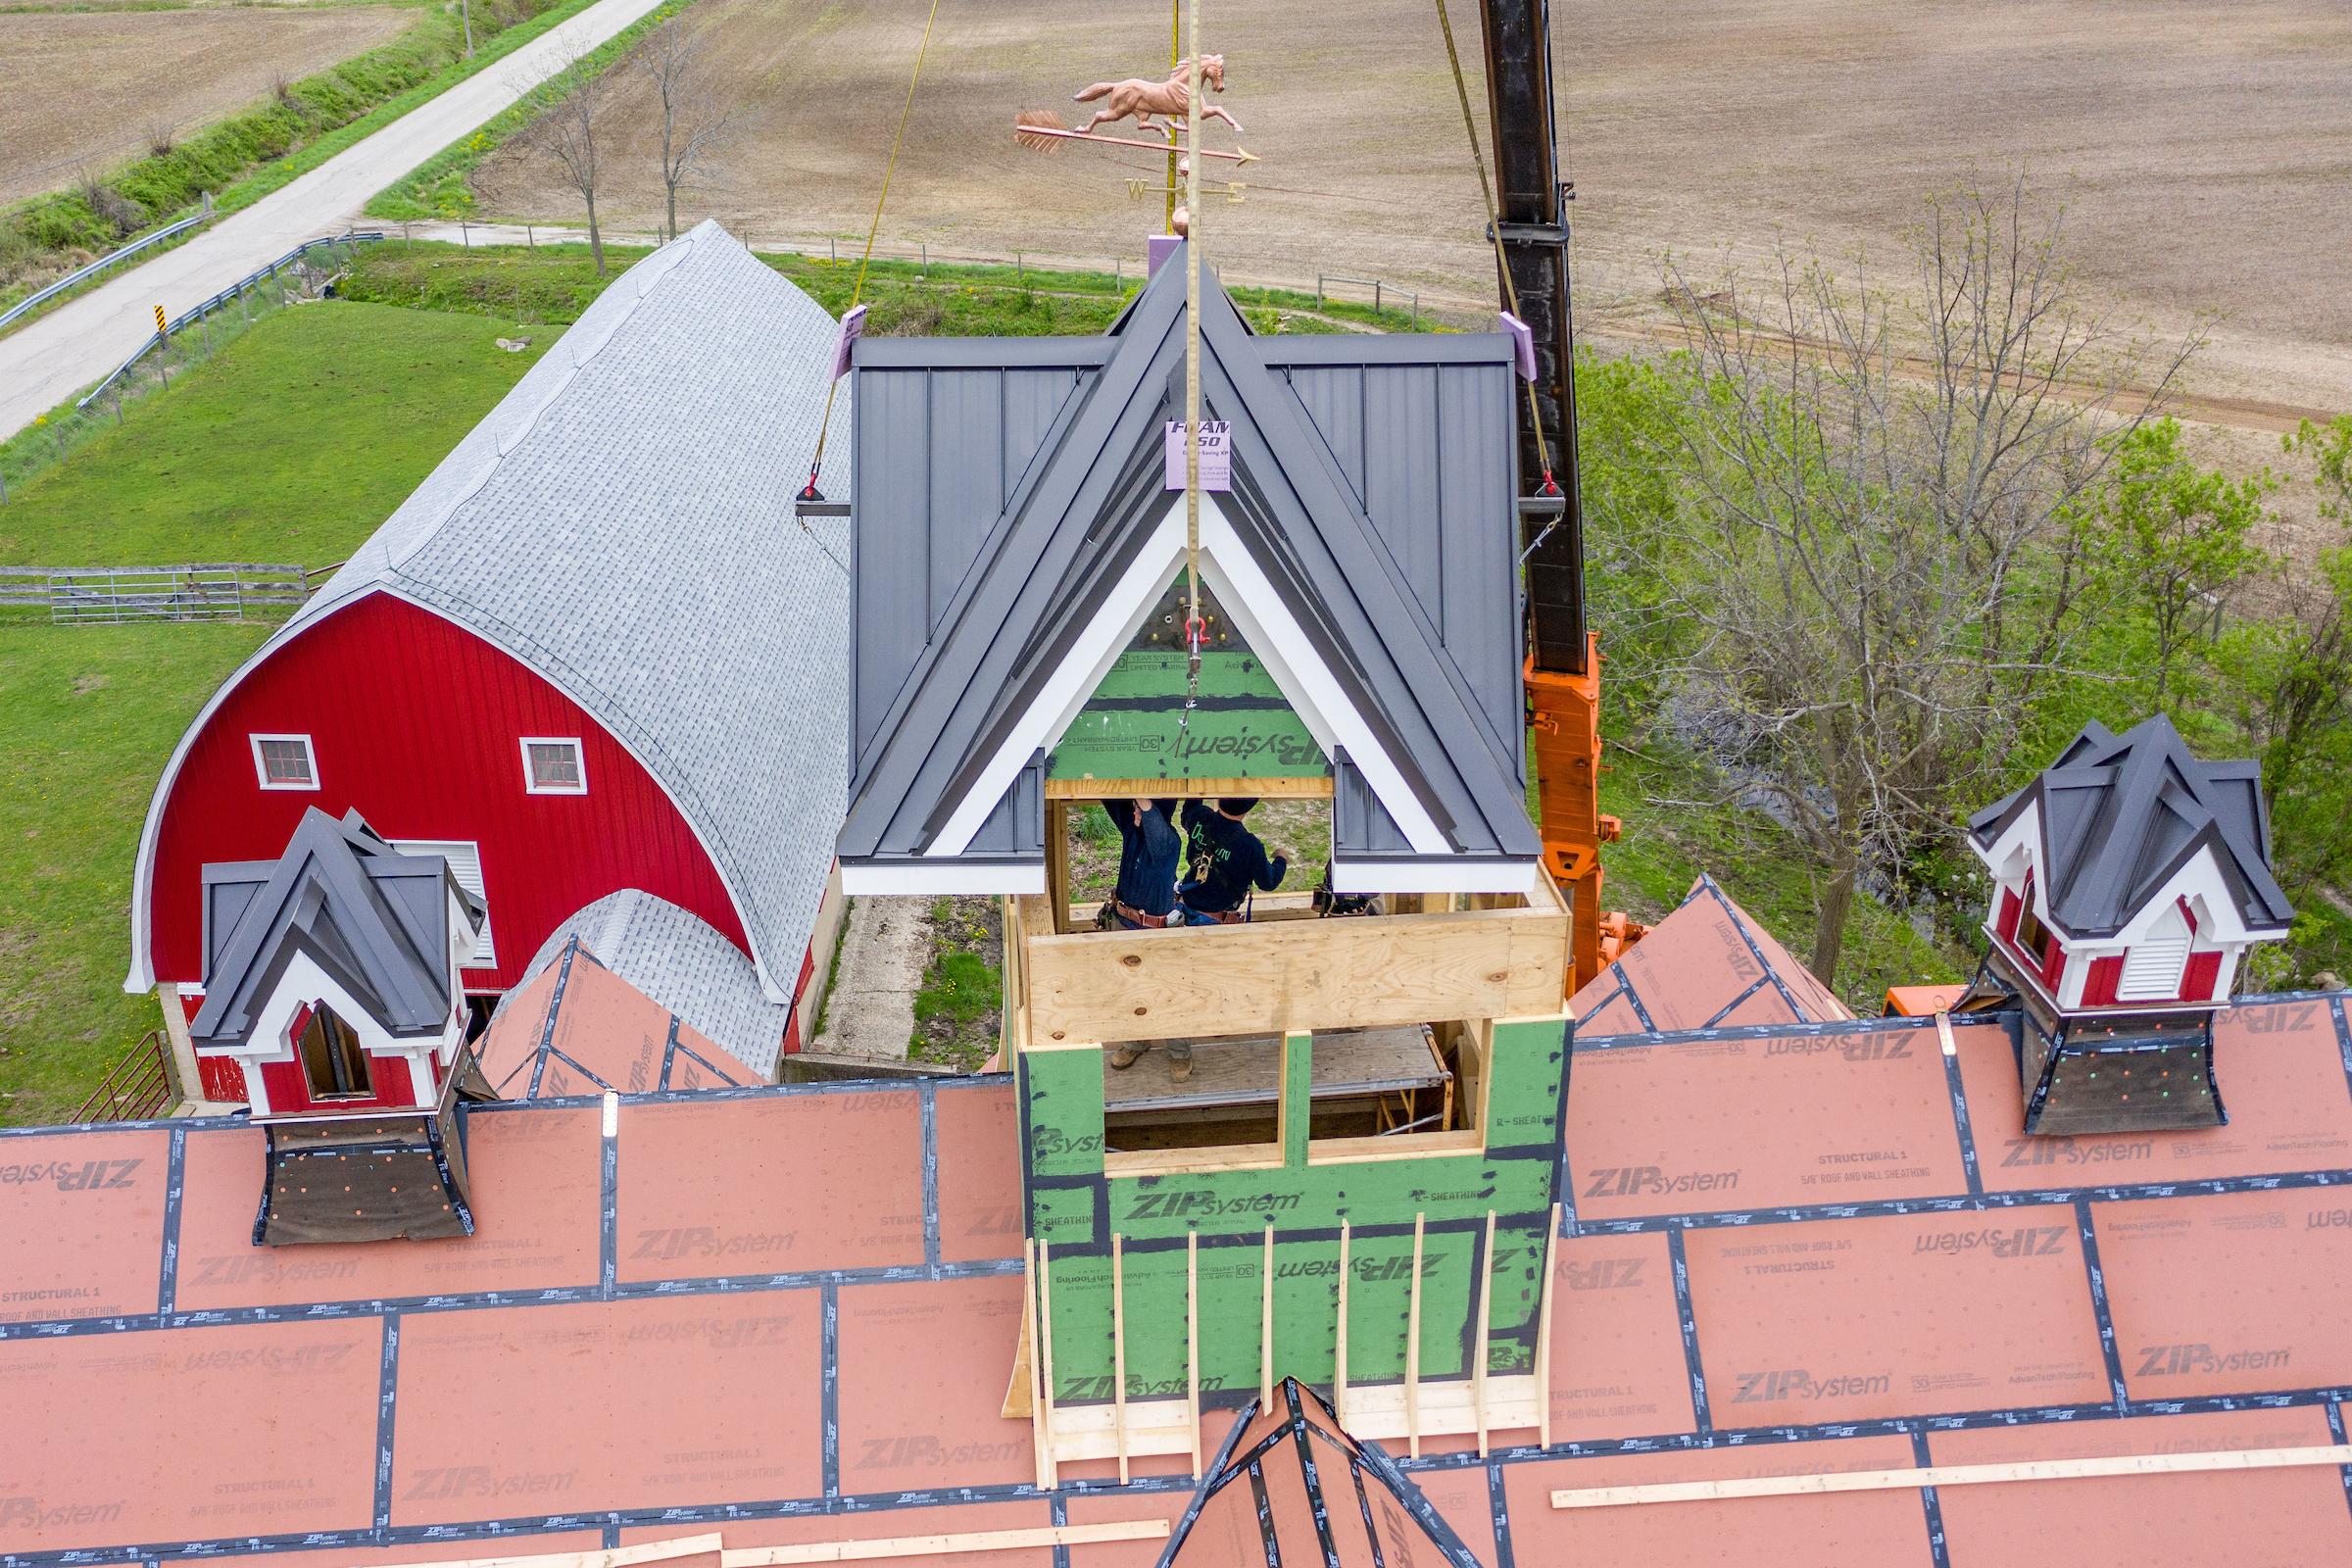 5.8.19 Belzowski Barn Cupolas 06.jpg